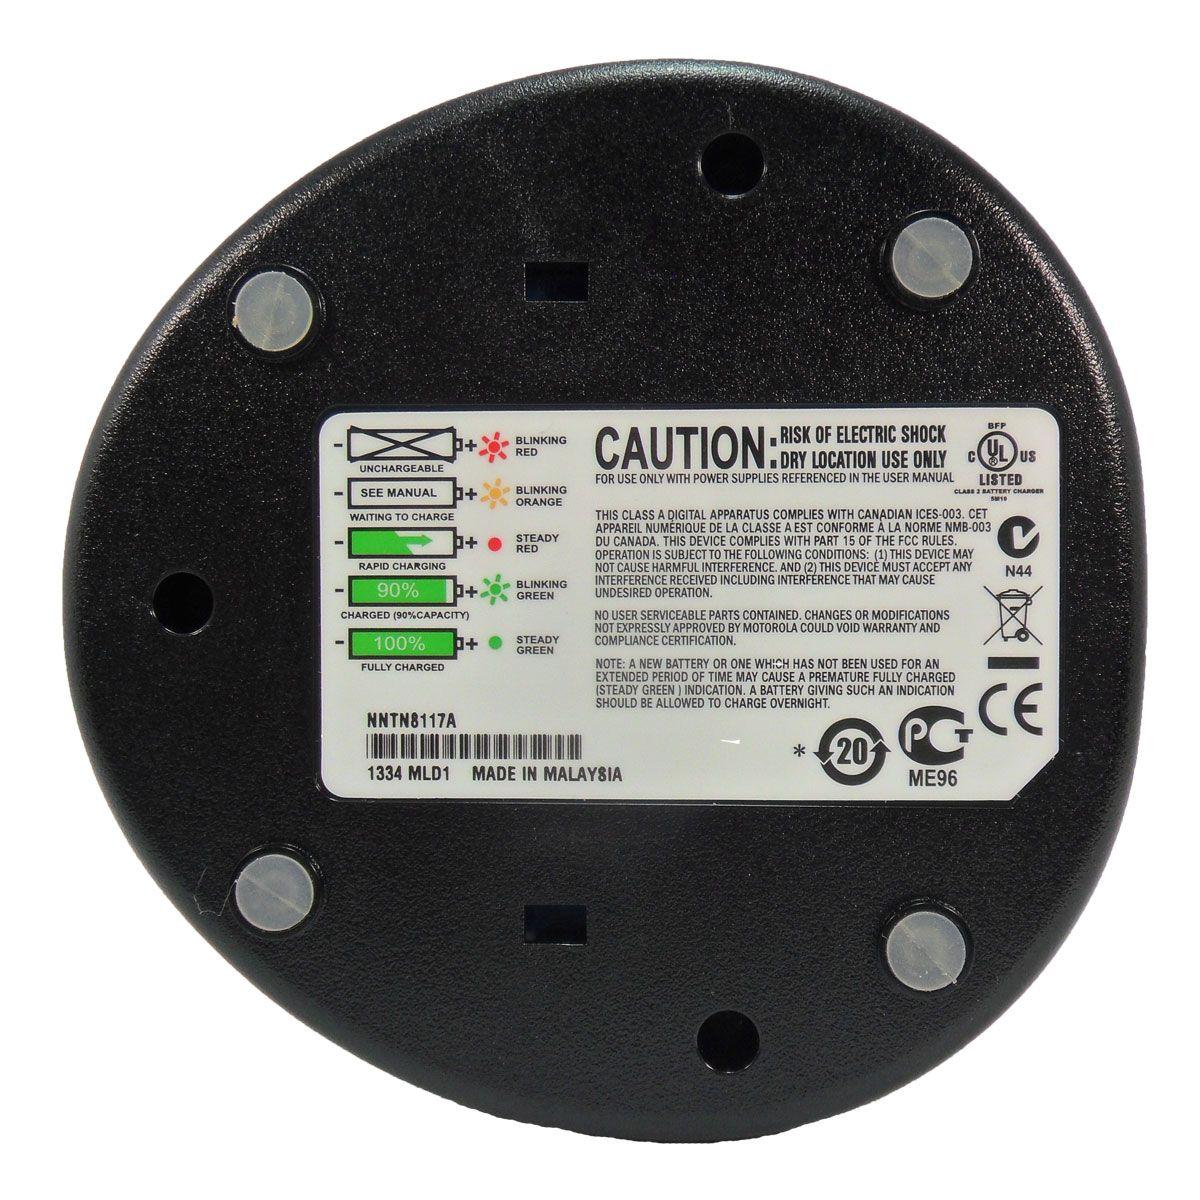 Cargador individual Motorola NNTN8117 para radio DEP550e